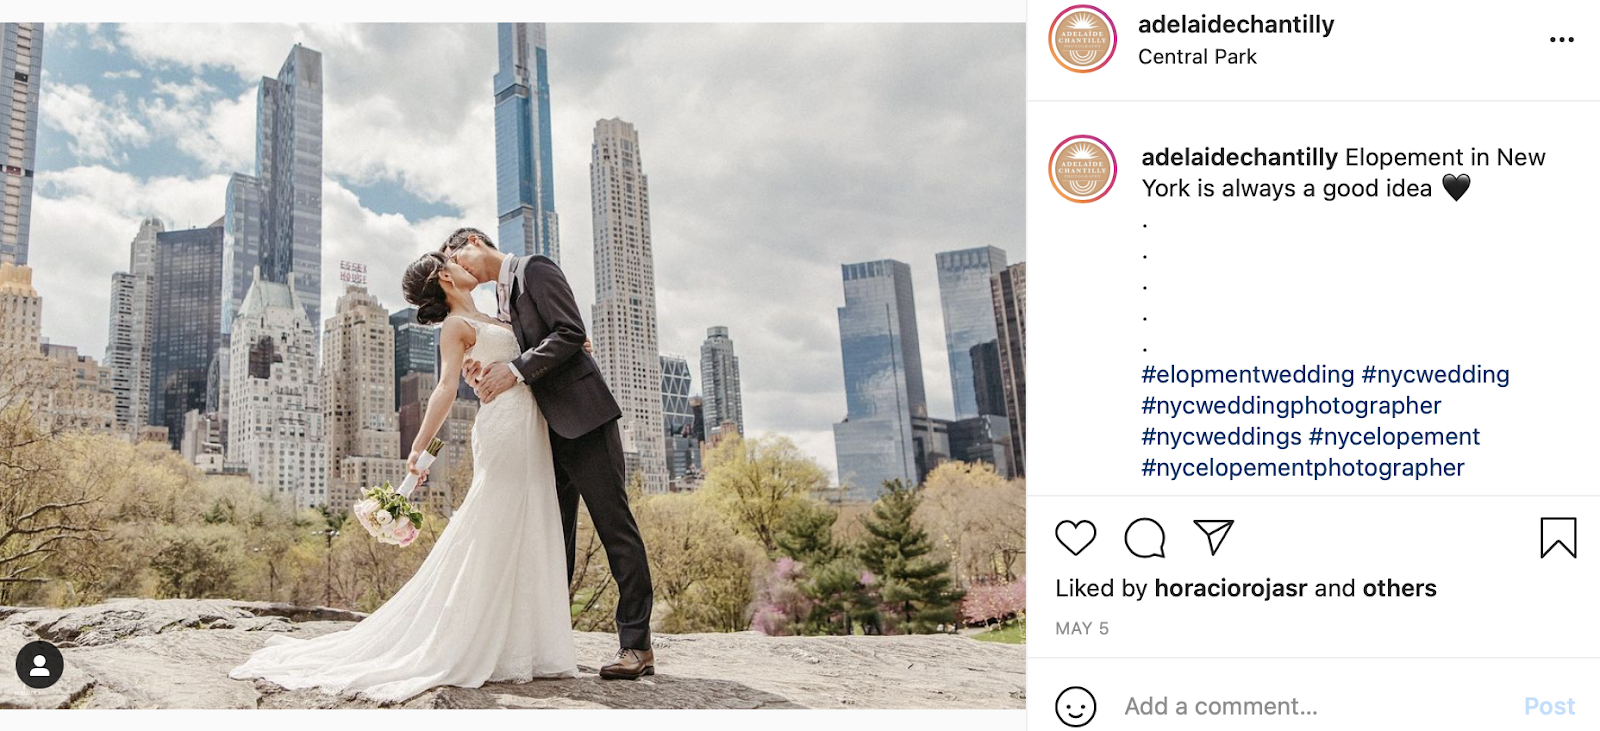 elopement wedding photo in New York